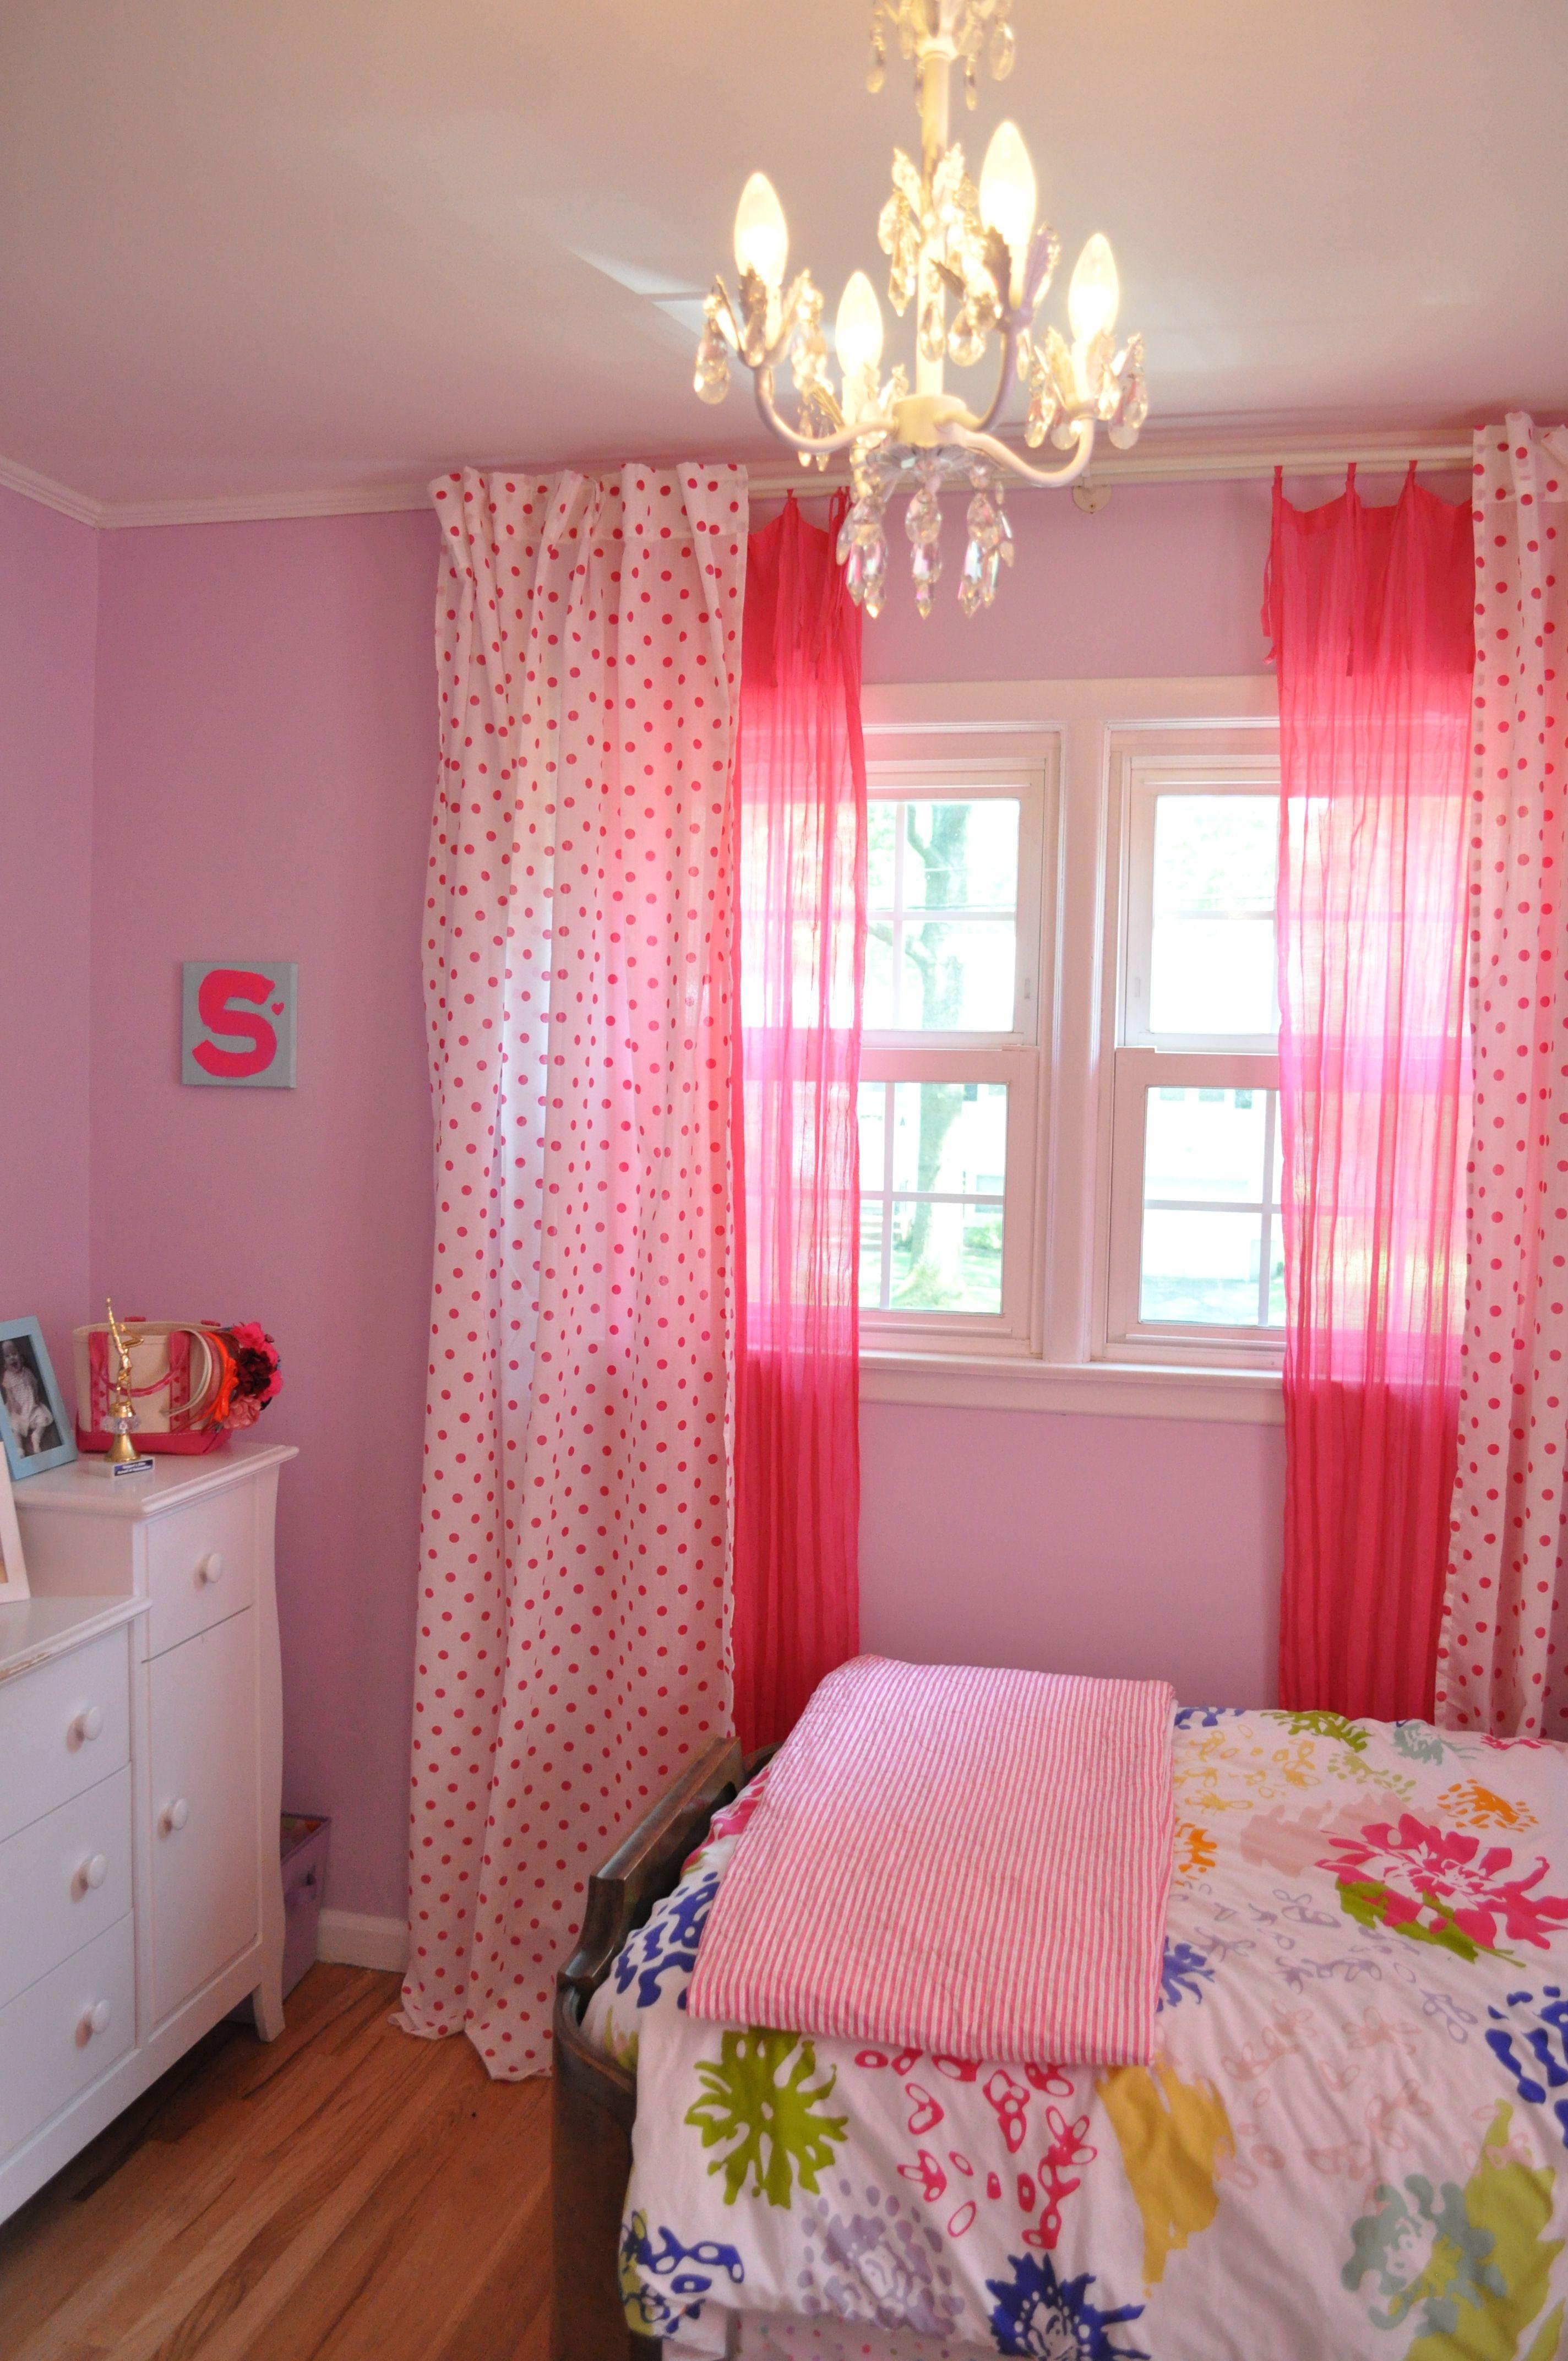 Diy Lengthening Our Master Bedroom Curtains Simple Bedroom